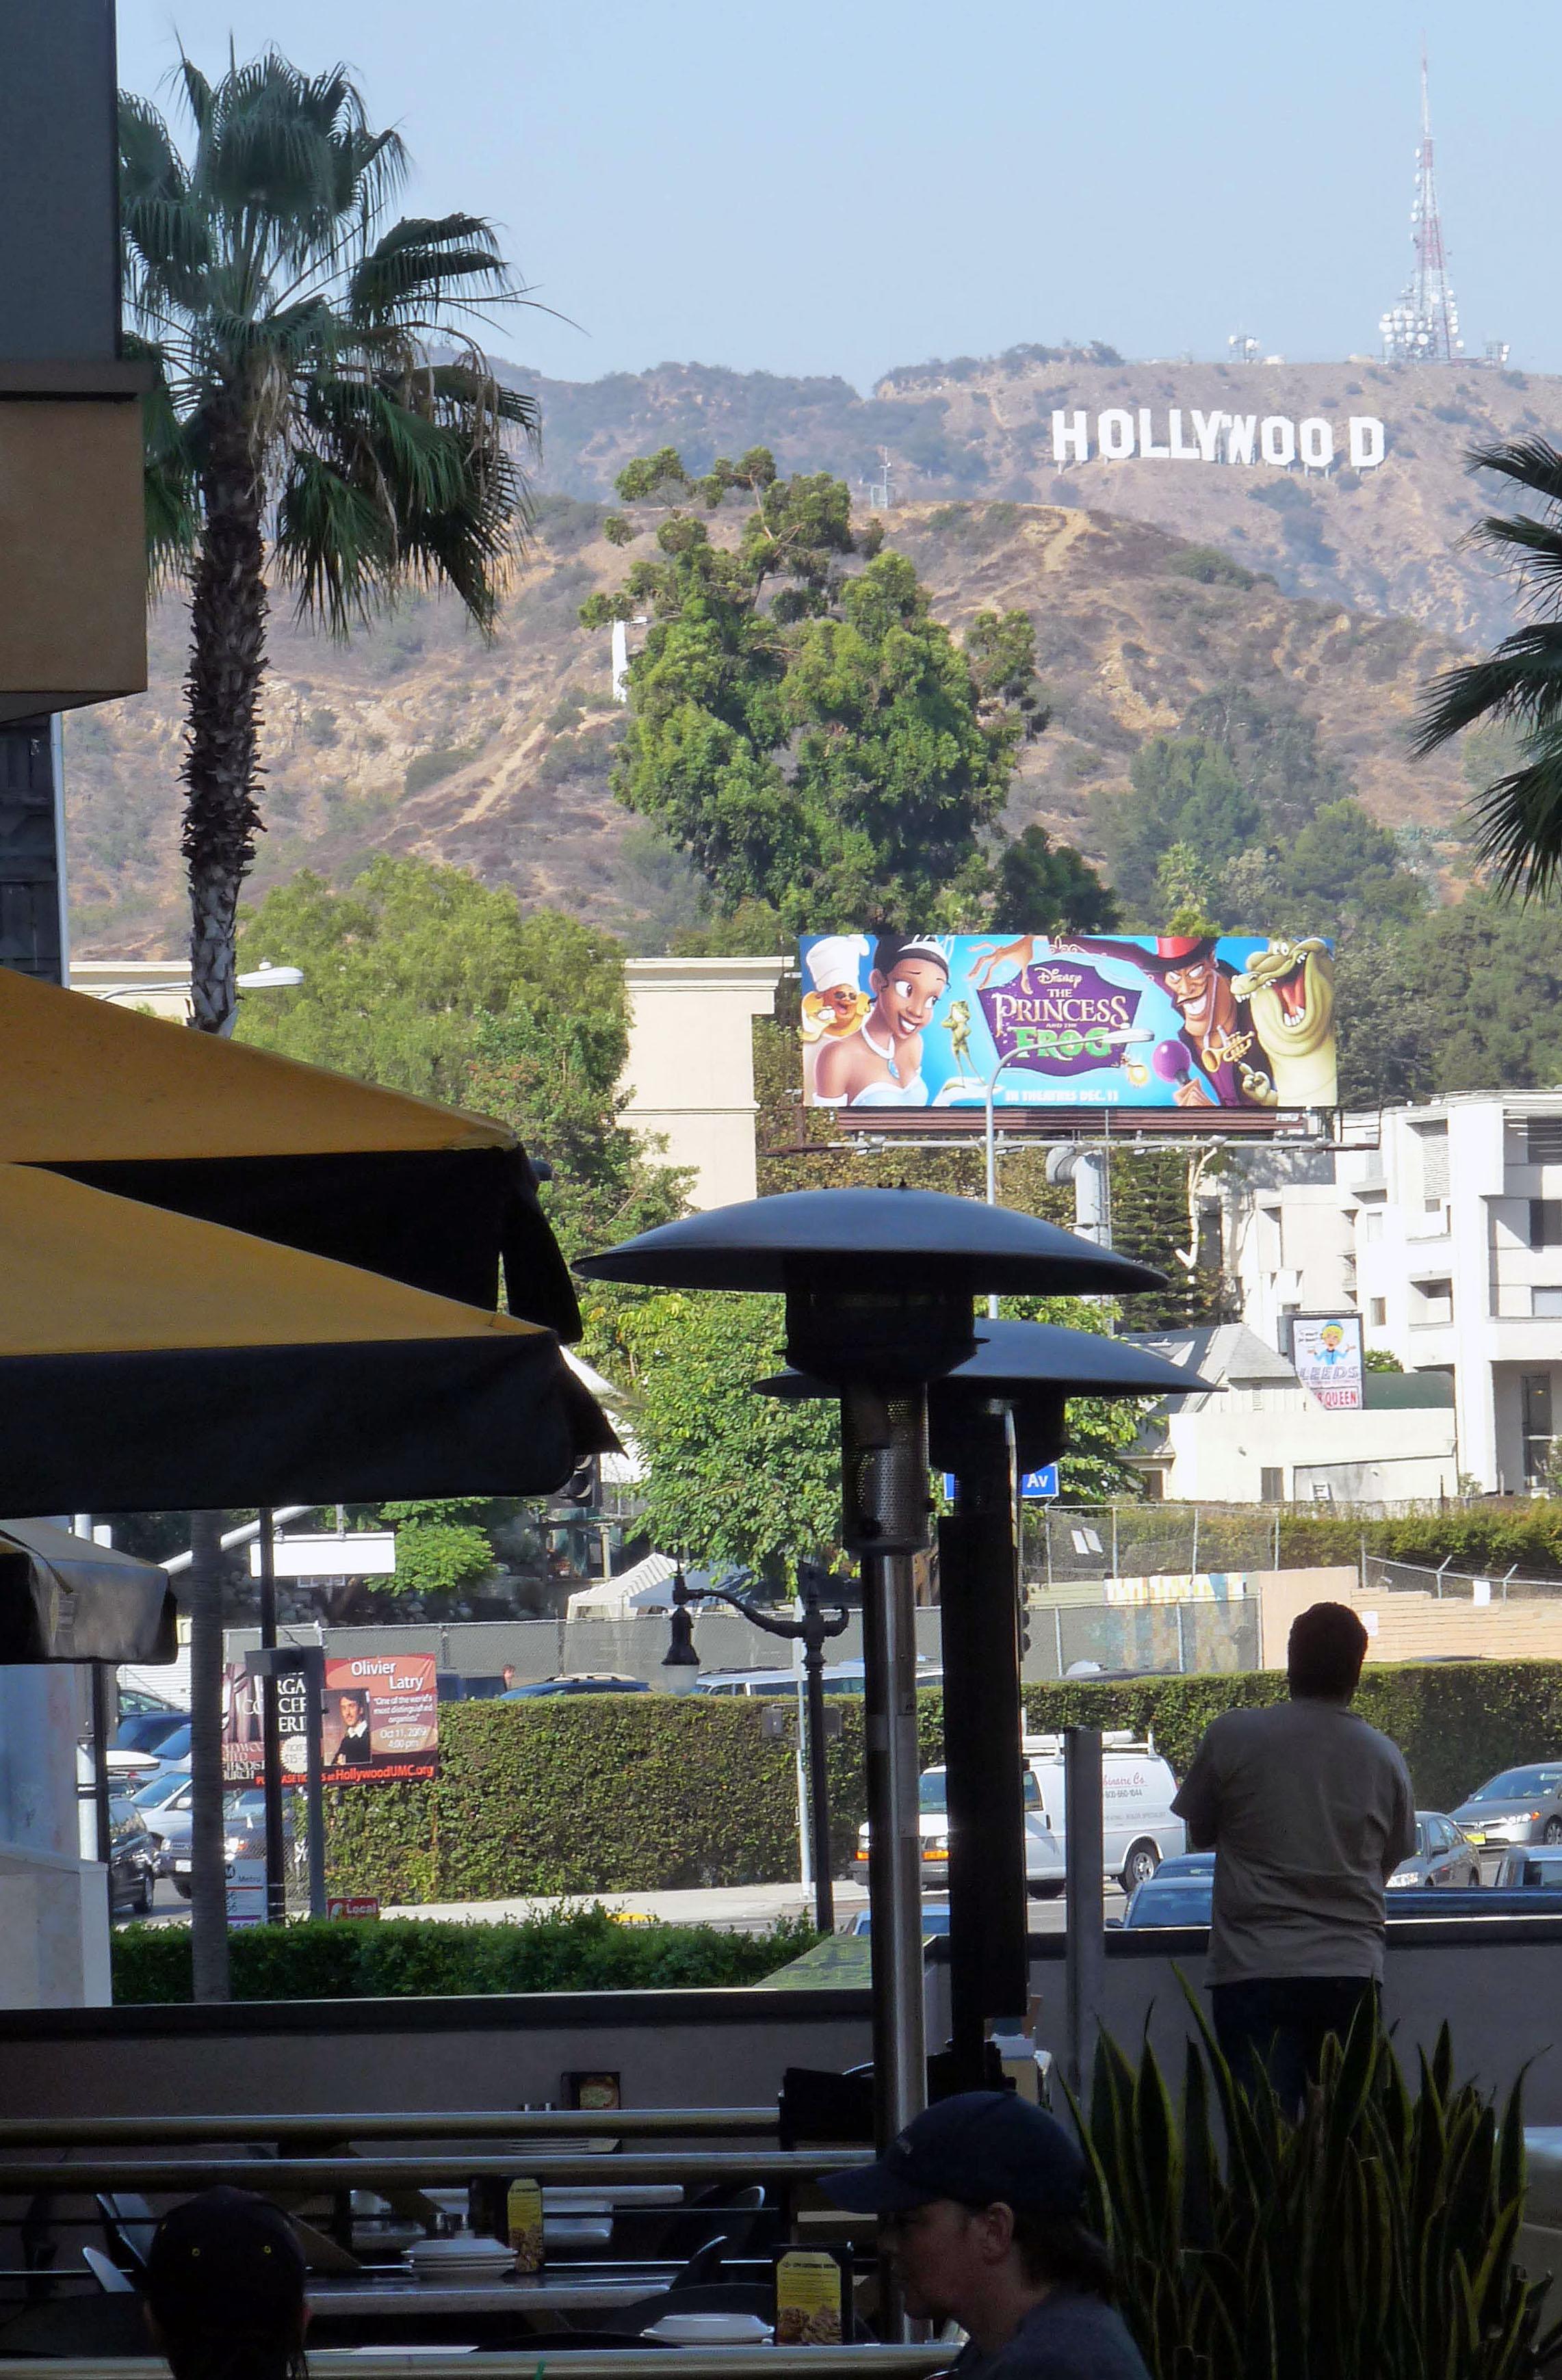 Los Angeles Photo Gallery | Coastcontact